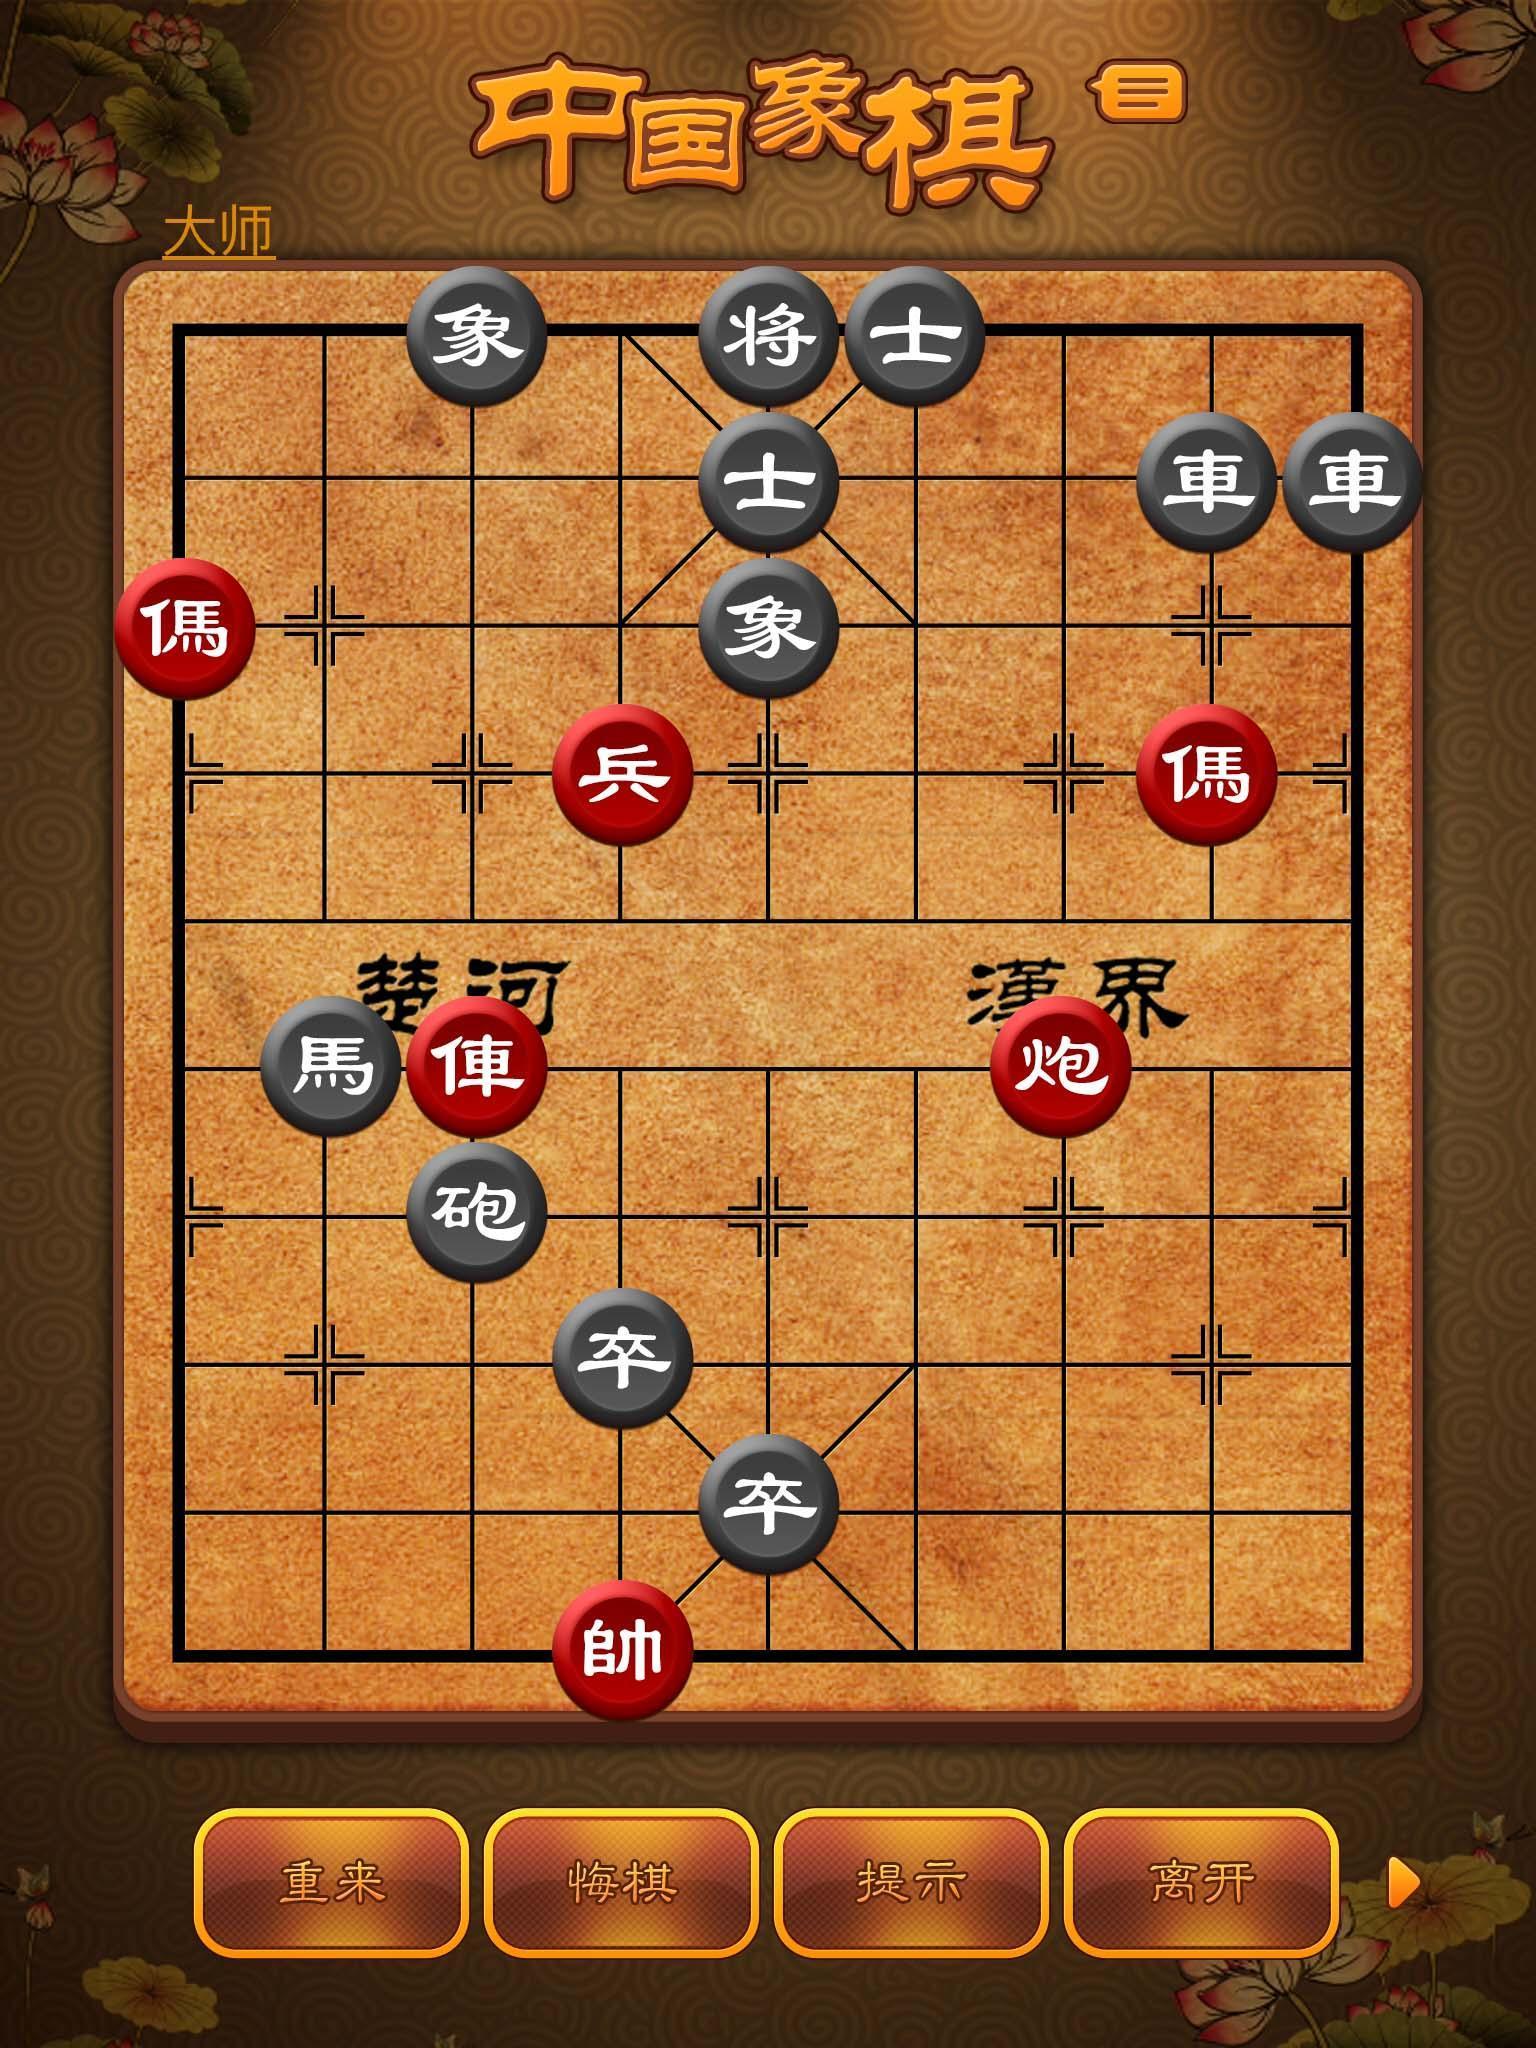 Chinese Chess, Xiangqi - many endgame and replay 3.9.6 Screenshot 13